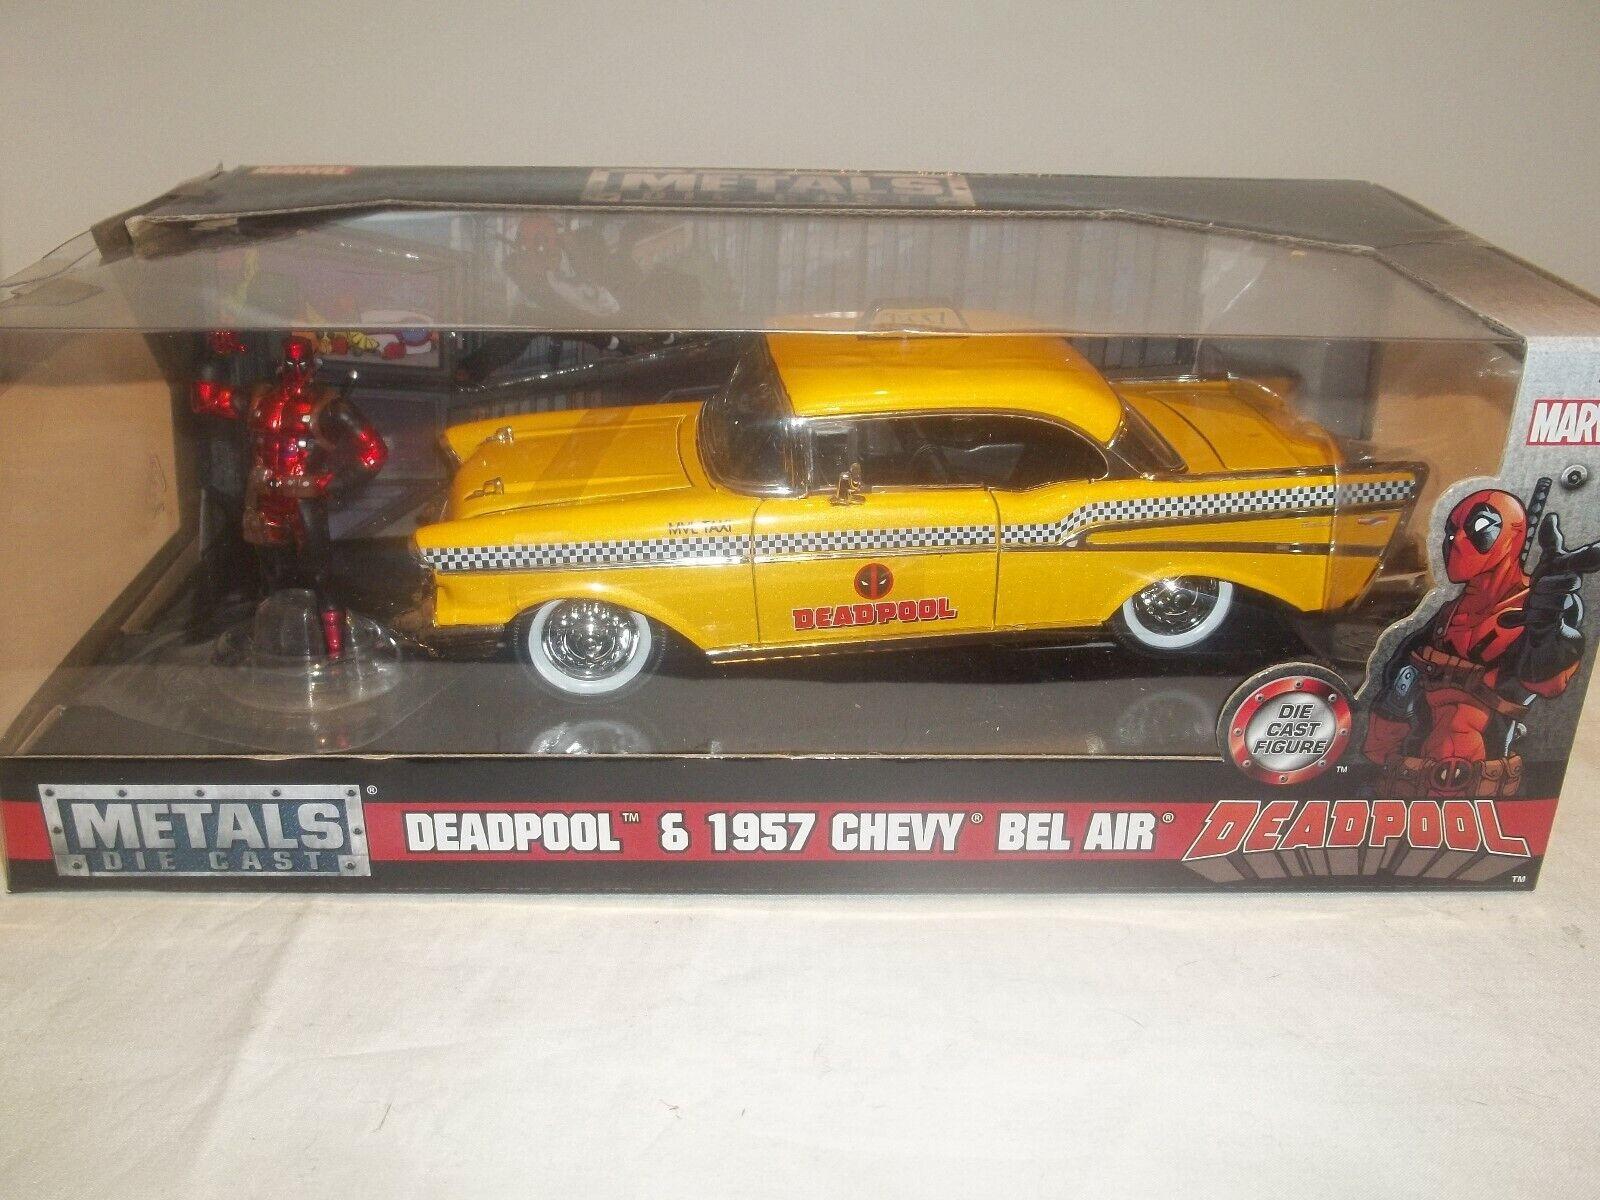 Jada 30290 Deadpool 1957 Chevy Bel Air + Figure 1 24 New & Boxed